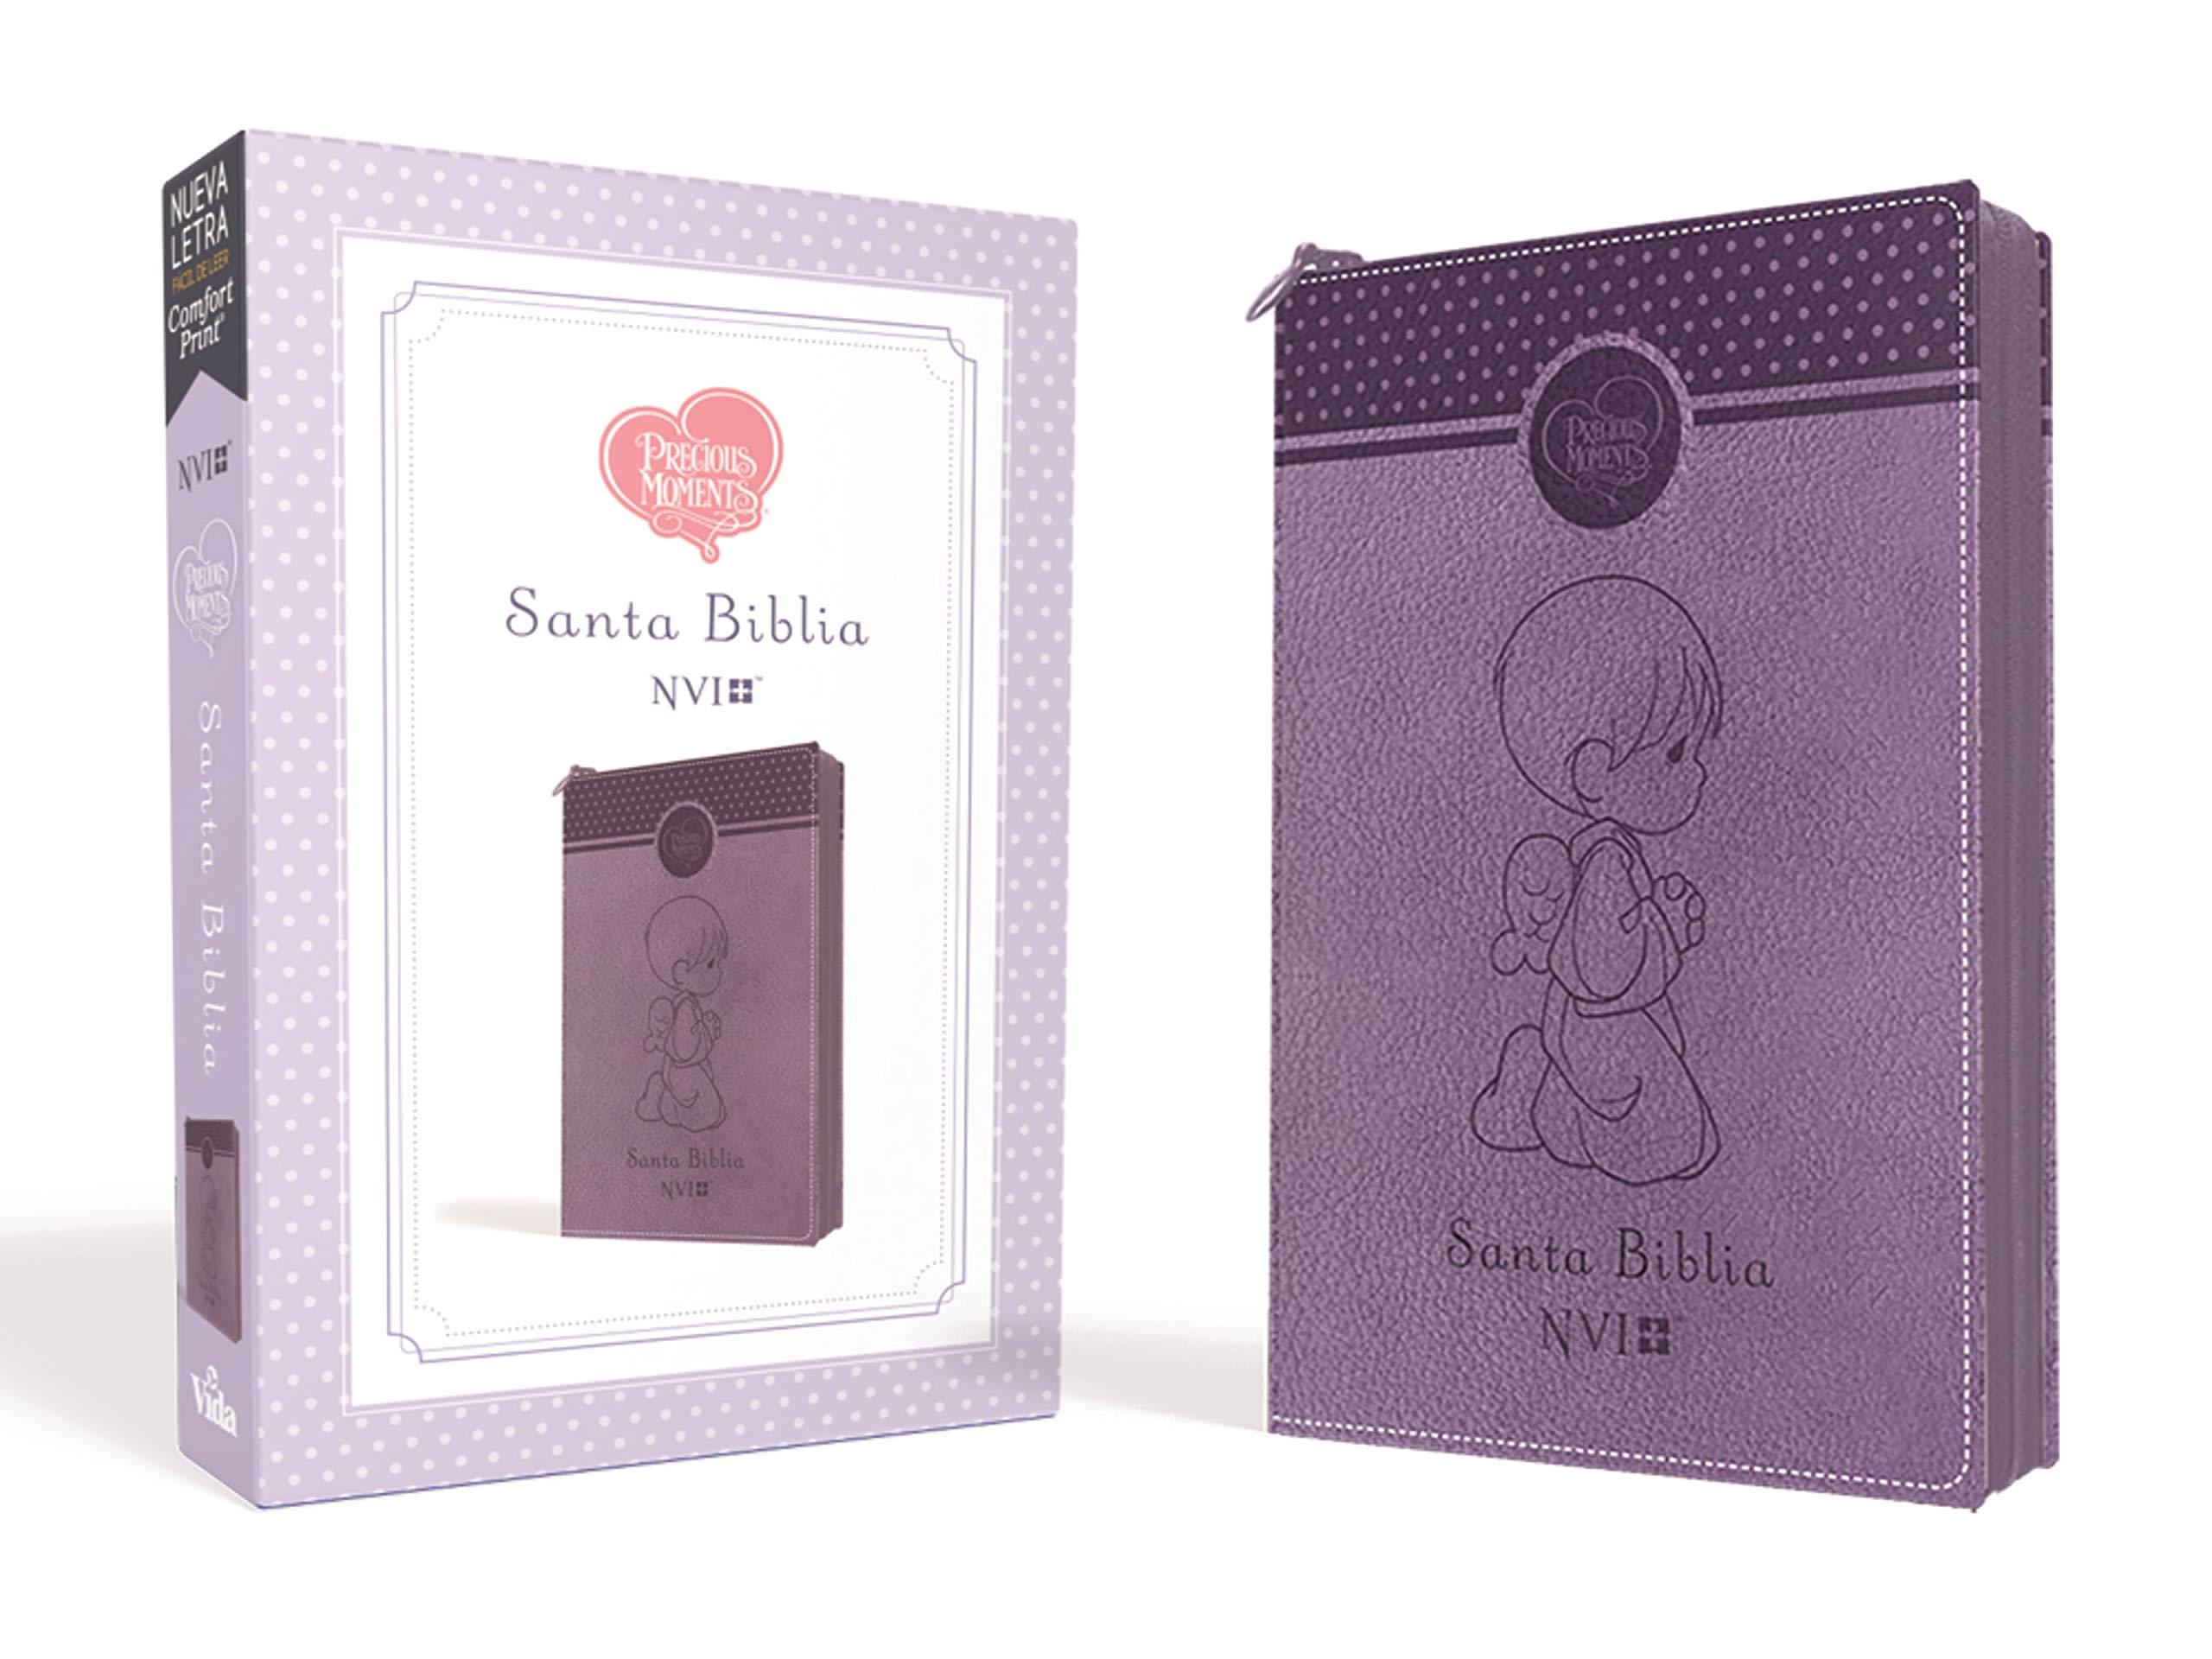 Biblia Precious Moments NVI Angelitos Ultrafina Compacta Purpura con cierre